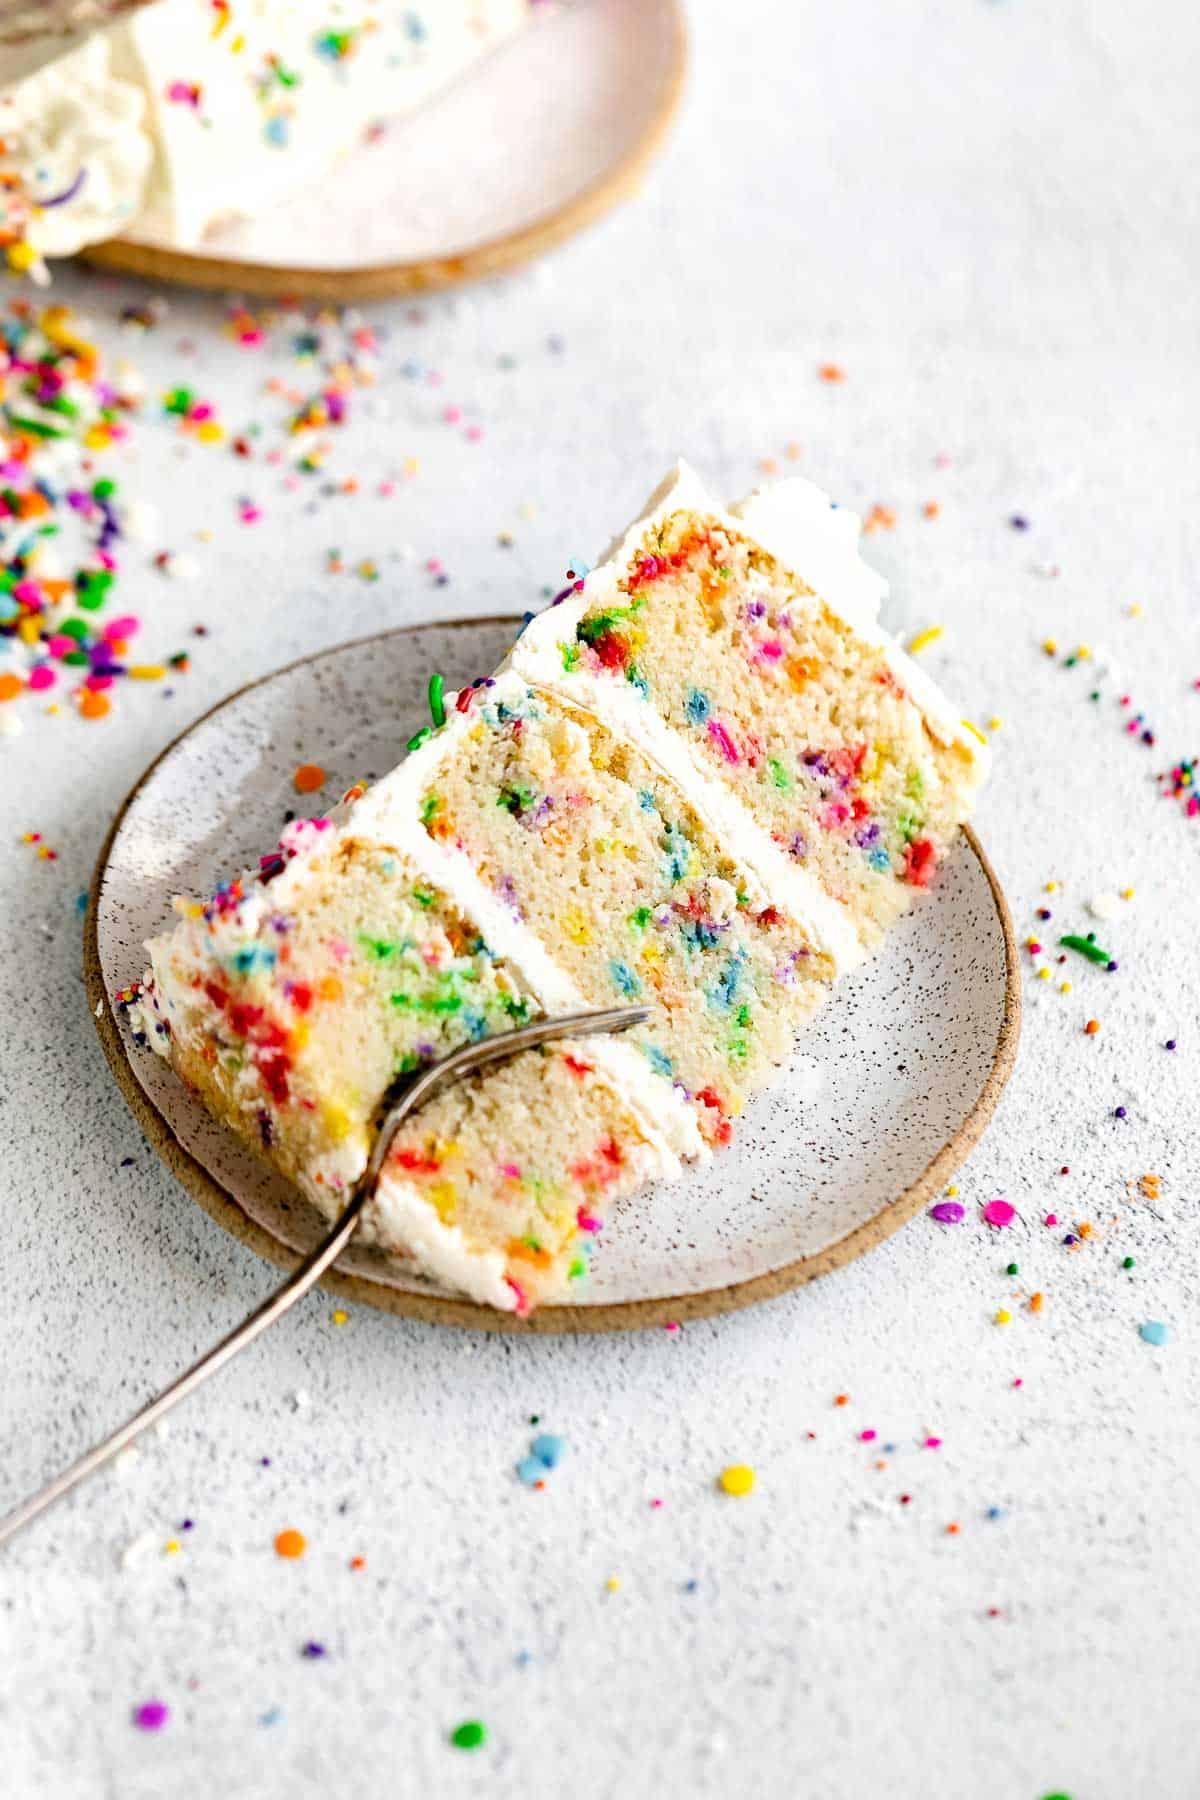 slice of three layer gluten free birthday cake with sprinkles